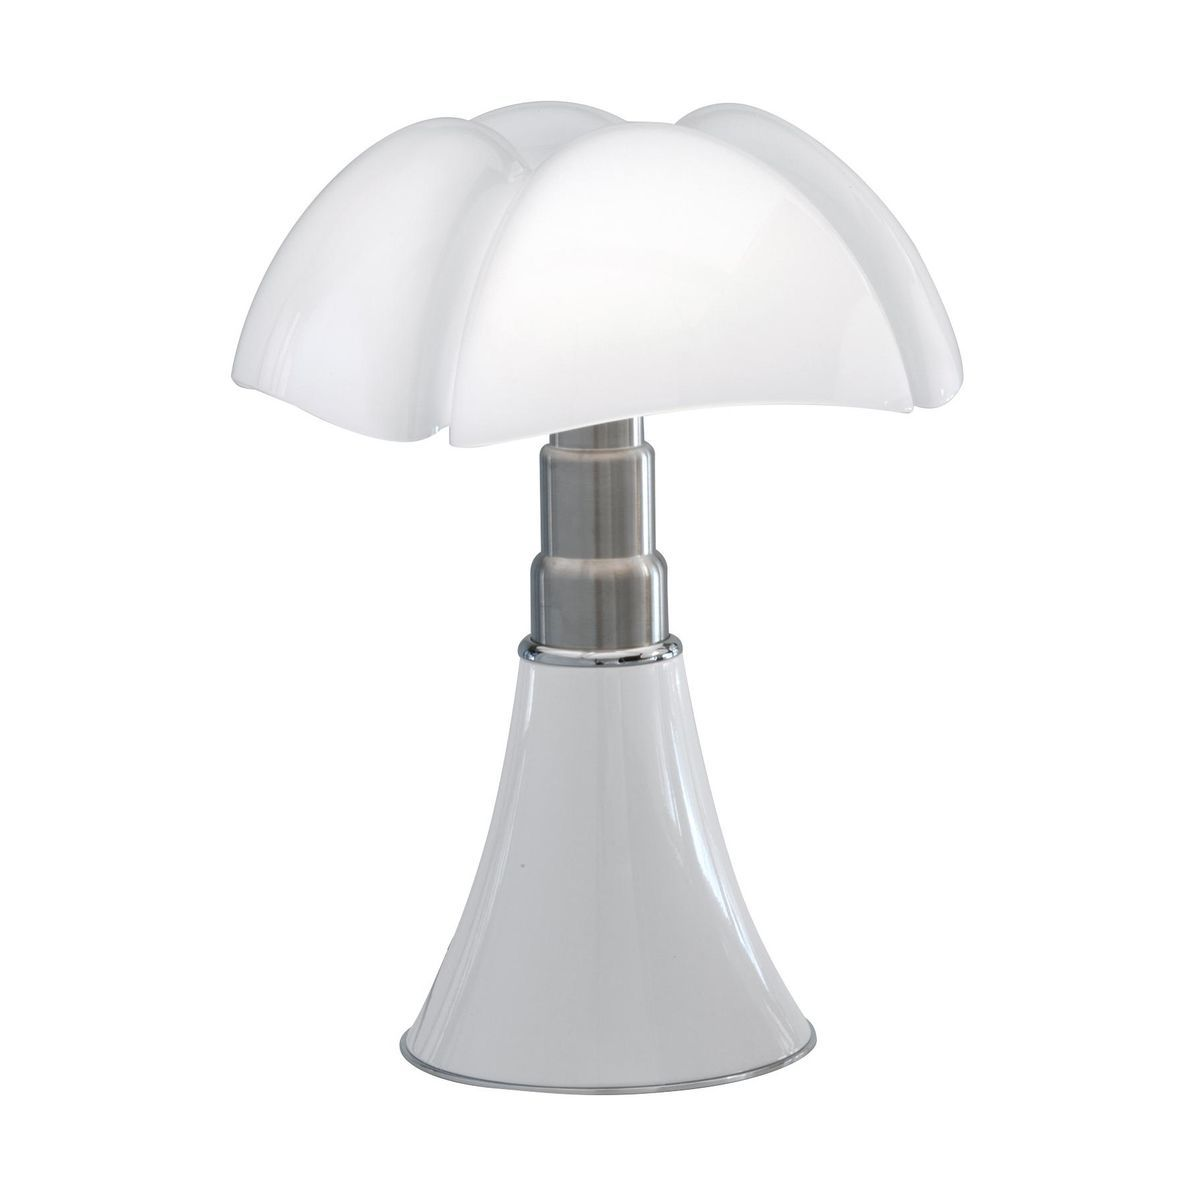 Top Pipistrello Table Lamp | Martinelli Luce | AmbienteDirect.com MH03